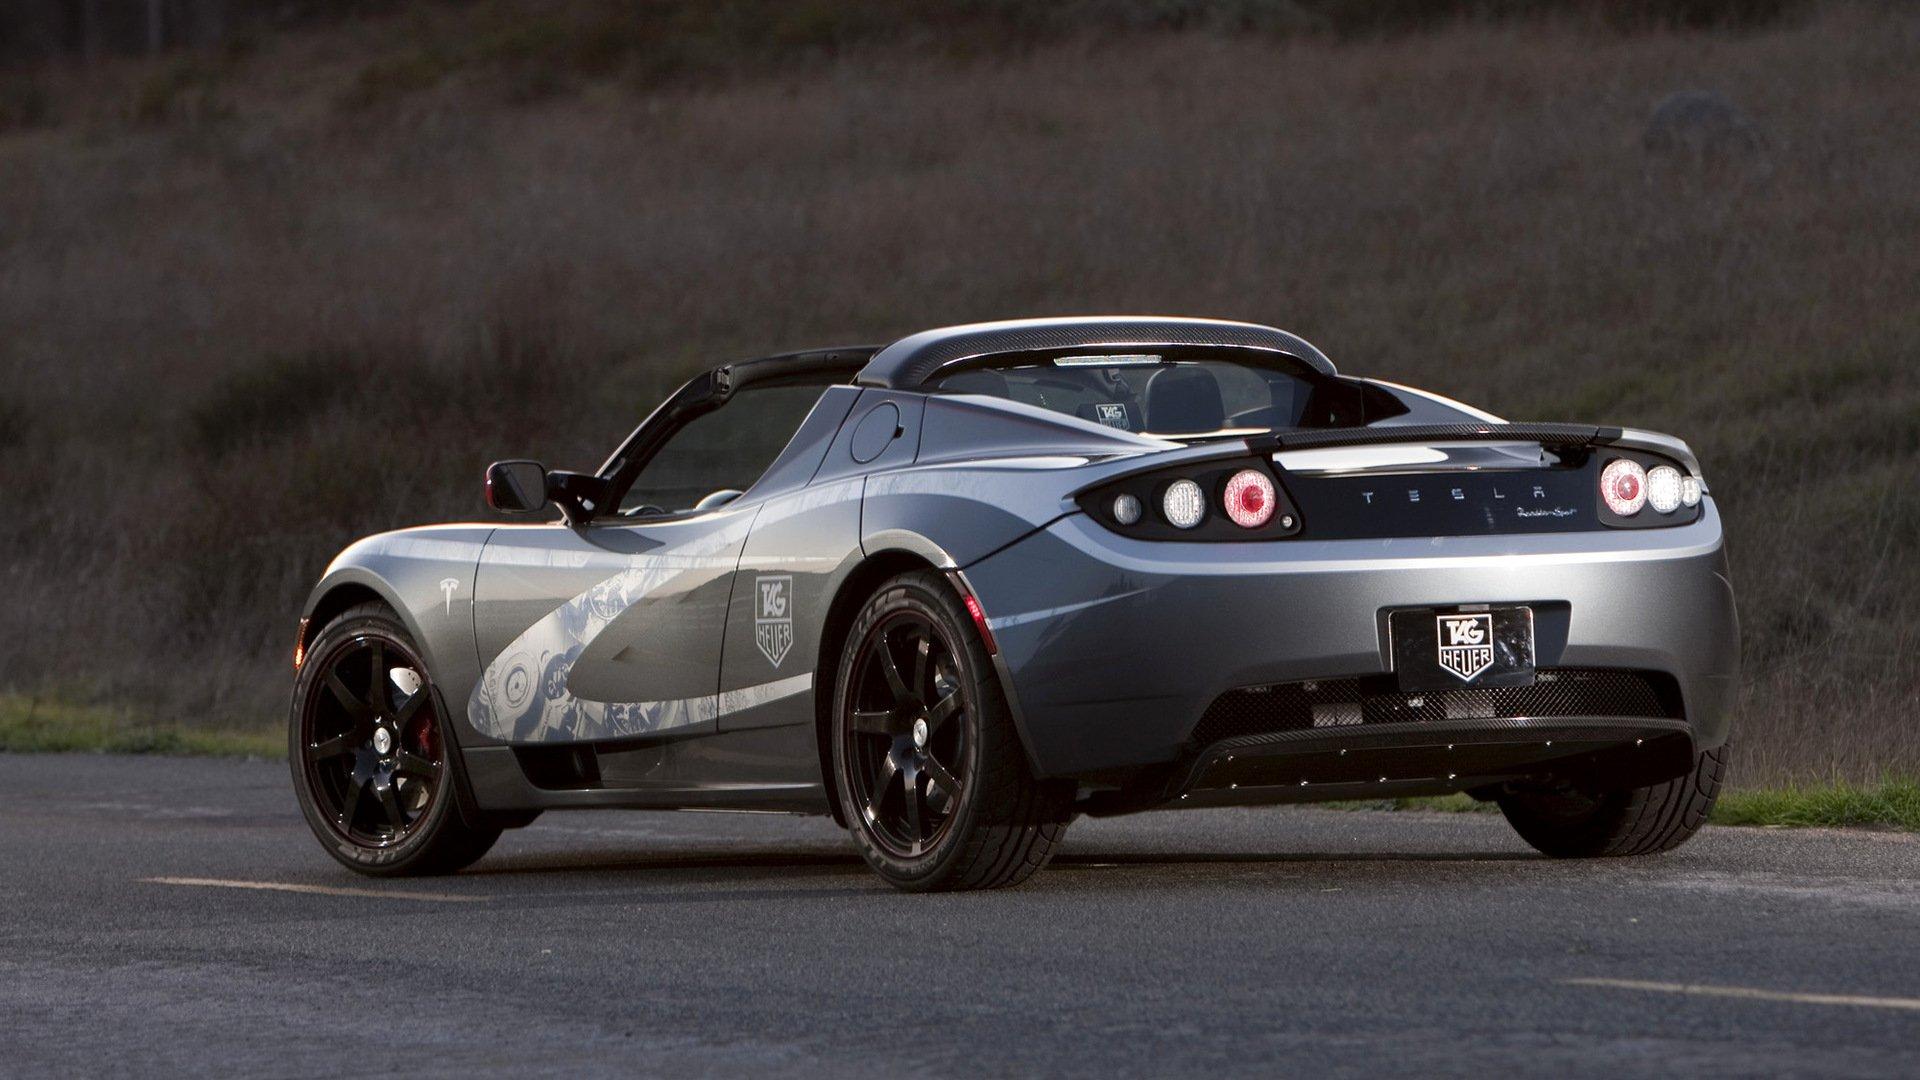 2010 tesla roadster sport hd wallpaper   background image